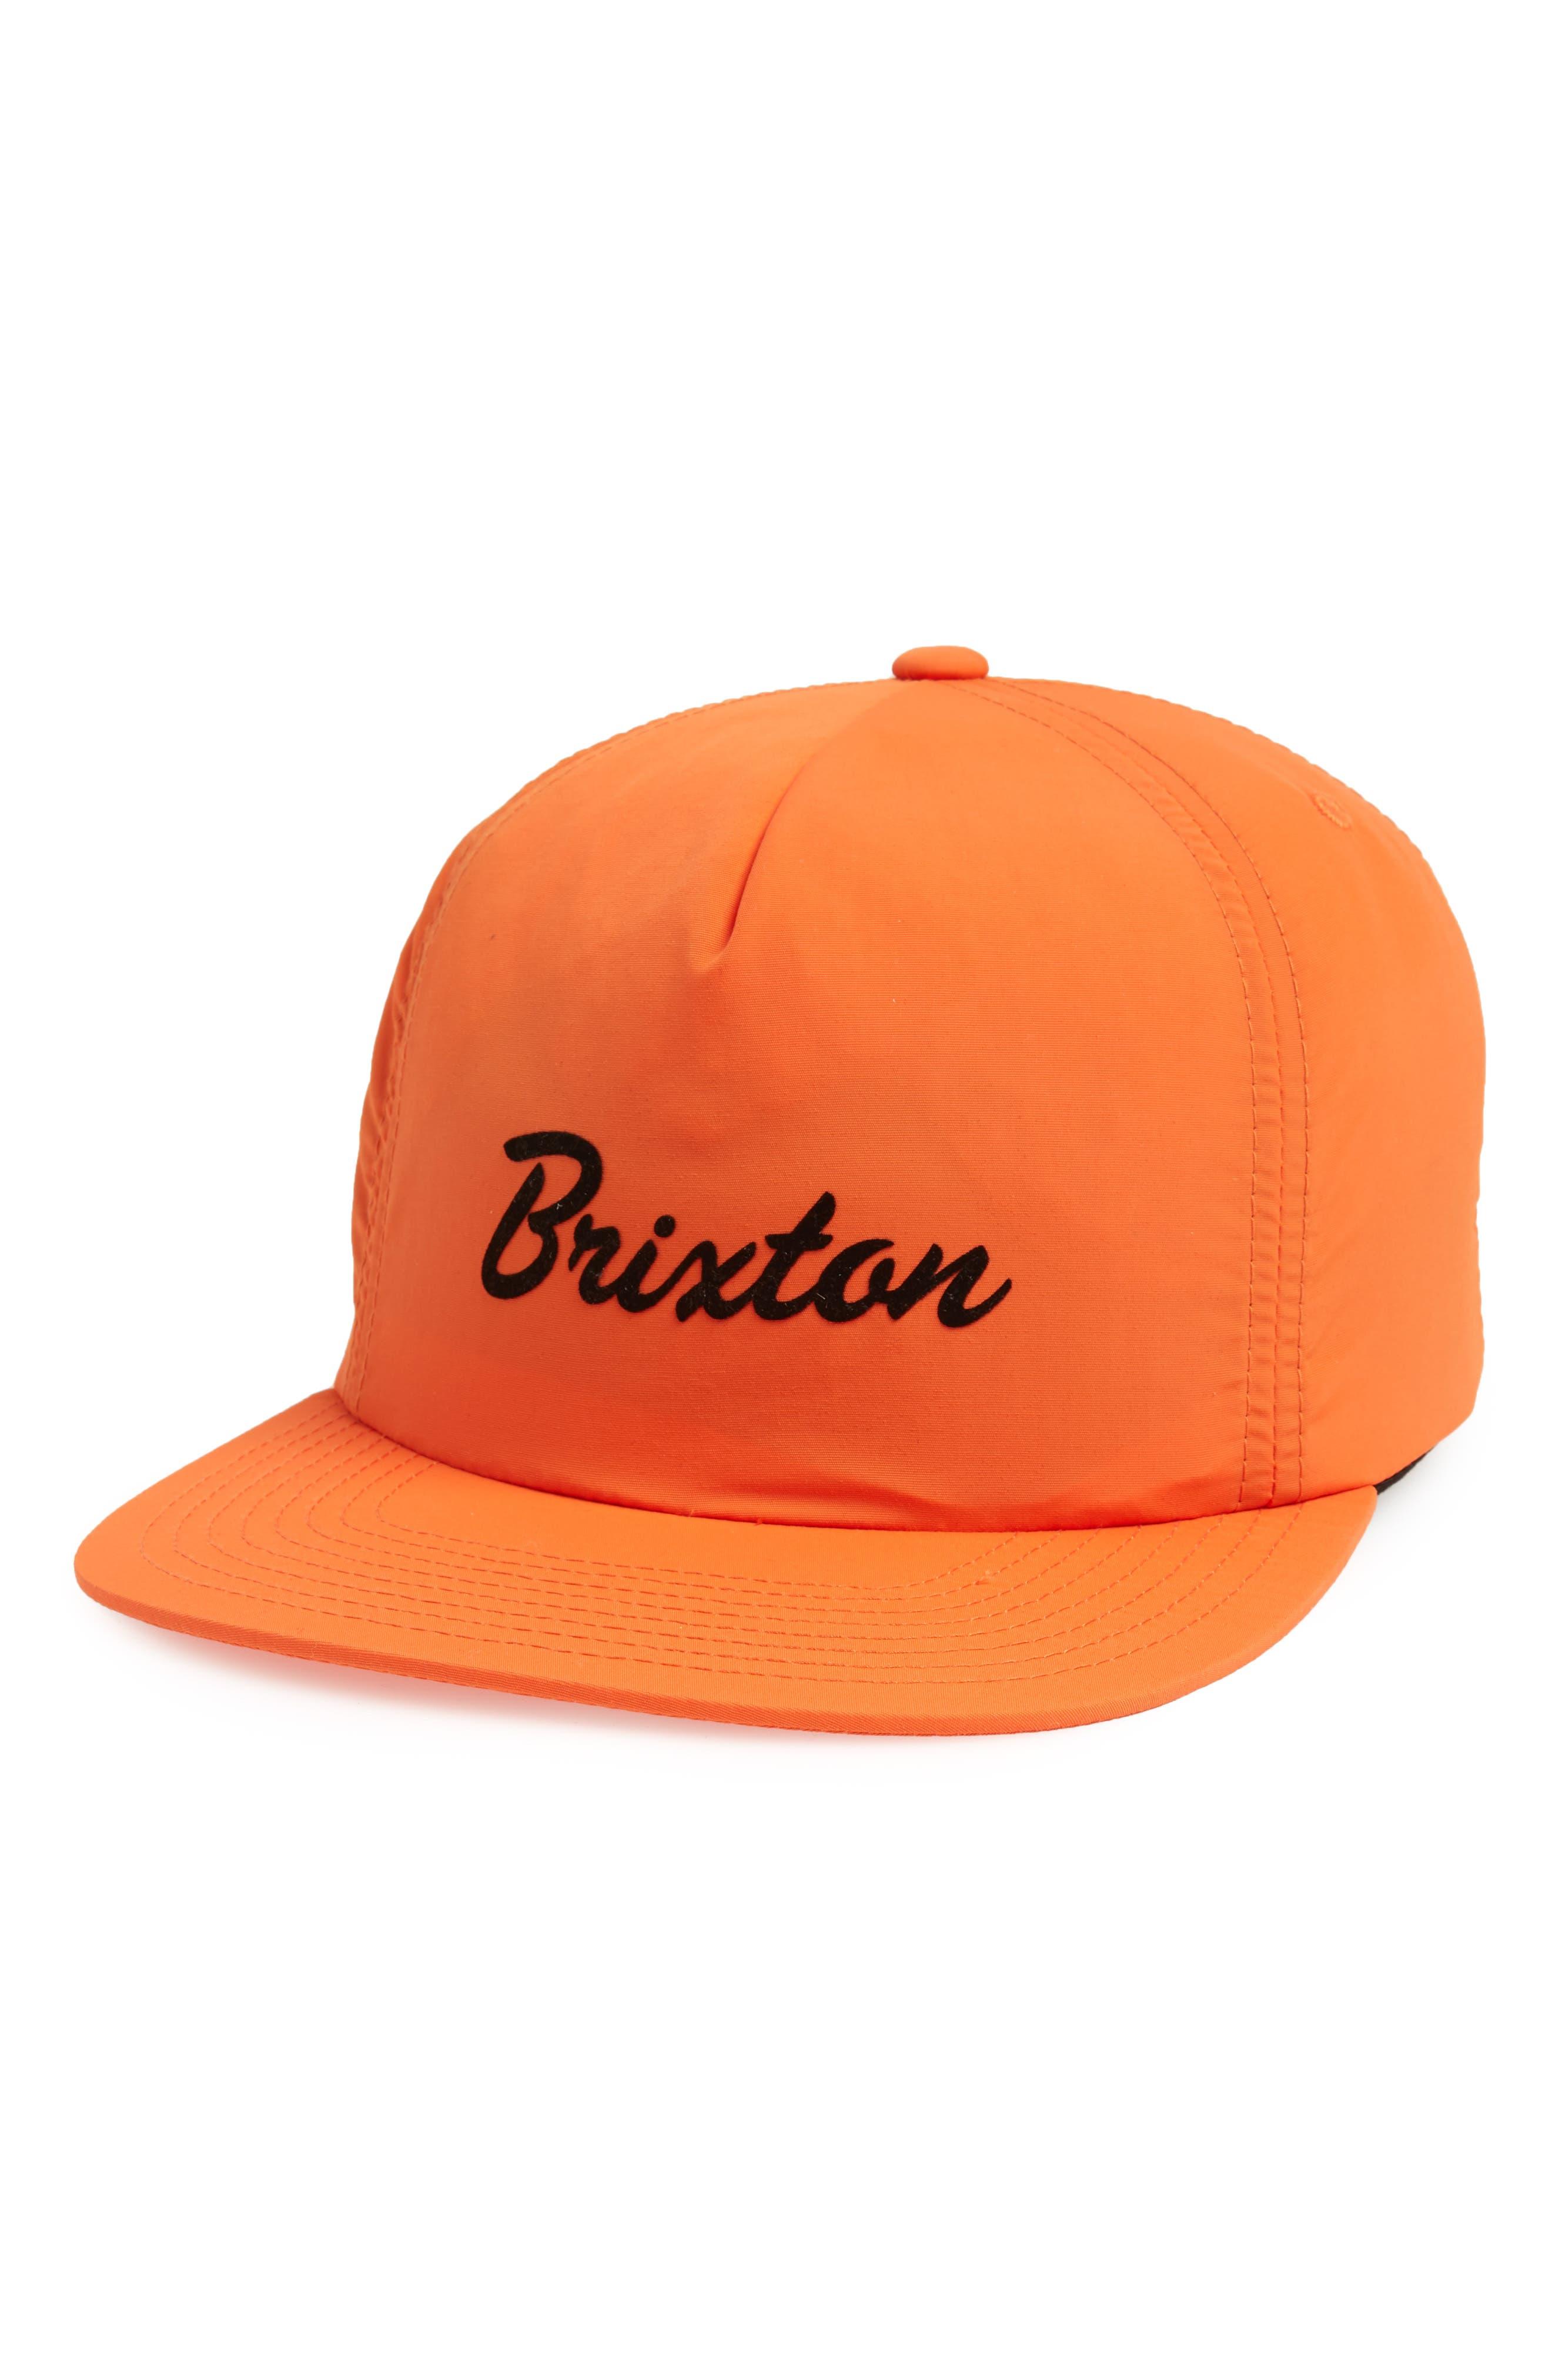 Blaine Ball Cap,                         Main,                         color, Orange